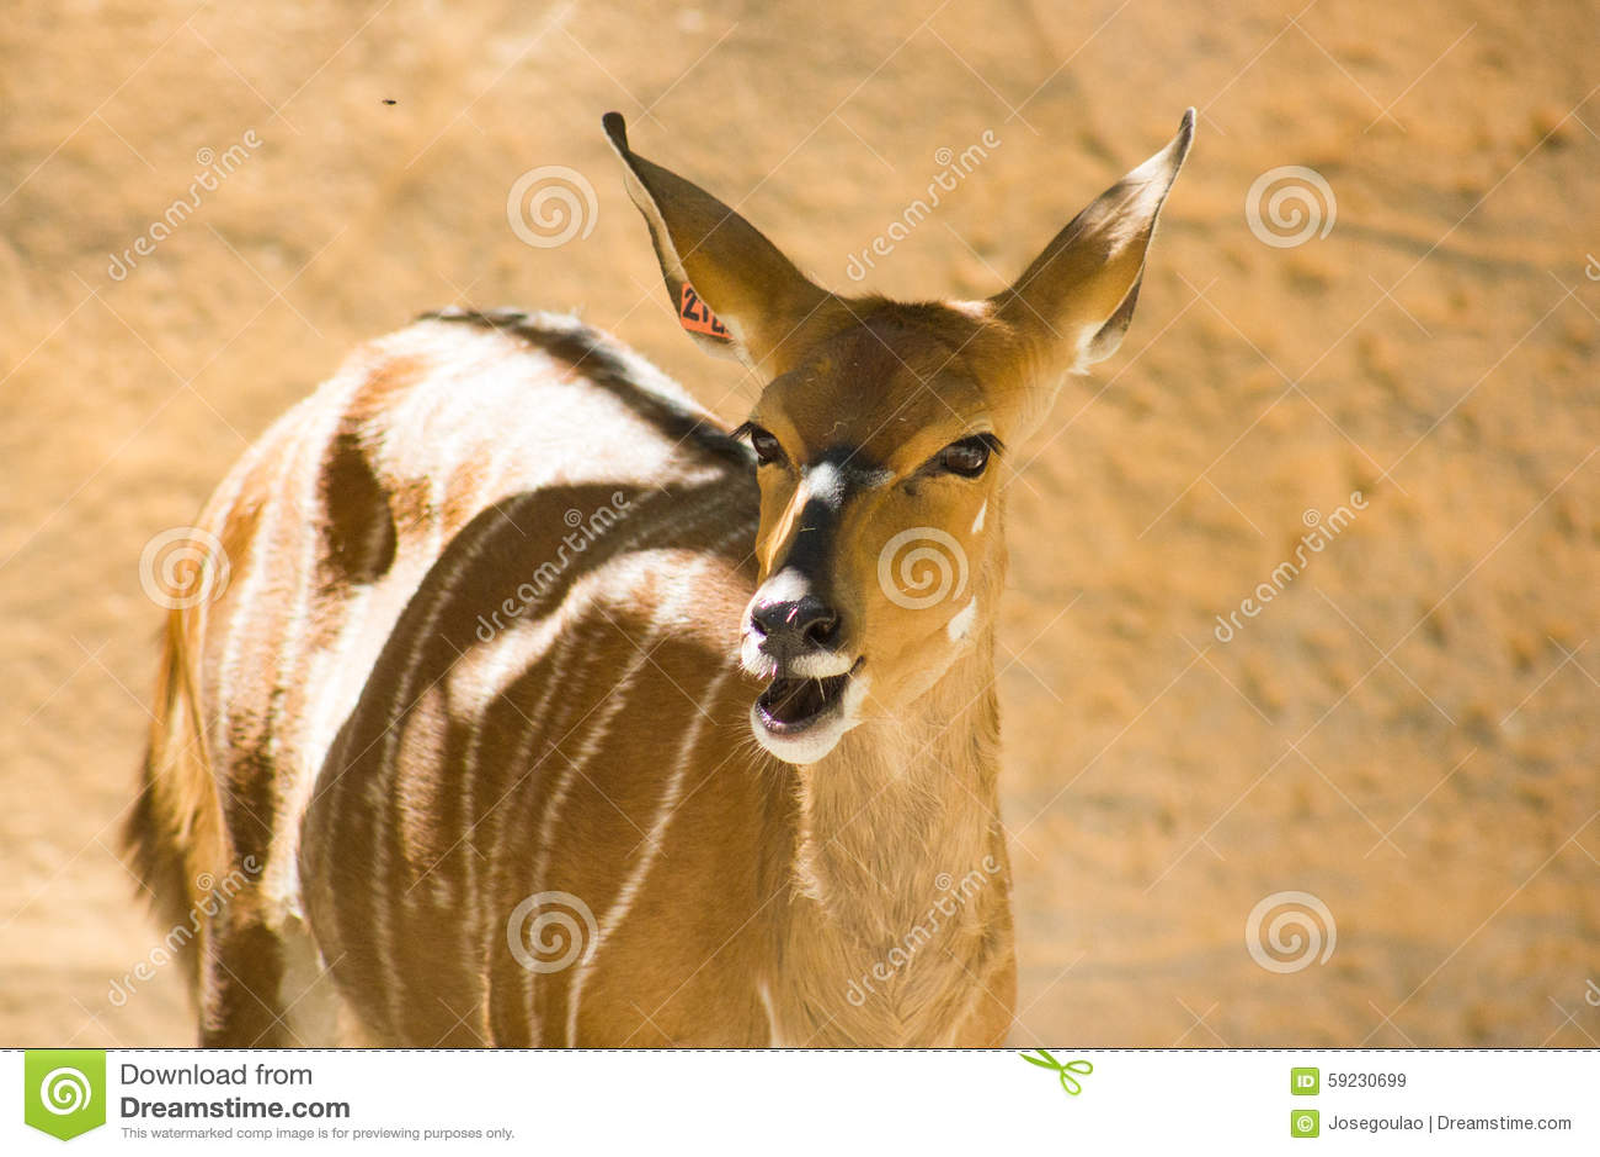 Nyala femenino (angasii del Tragelaphus), también llamado inyala Bóvidos, zoológicos